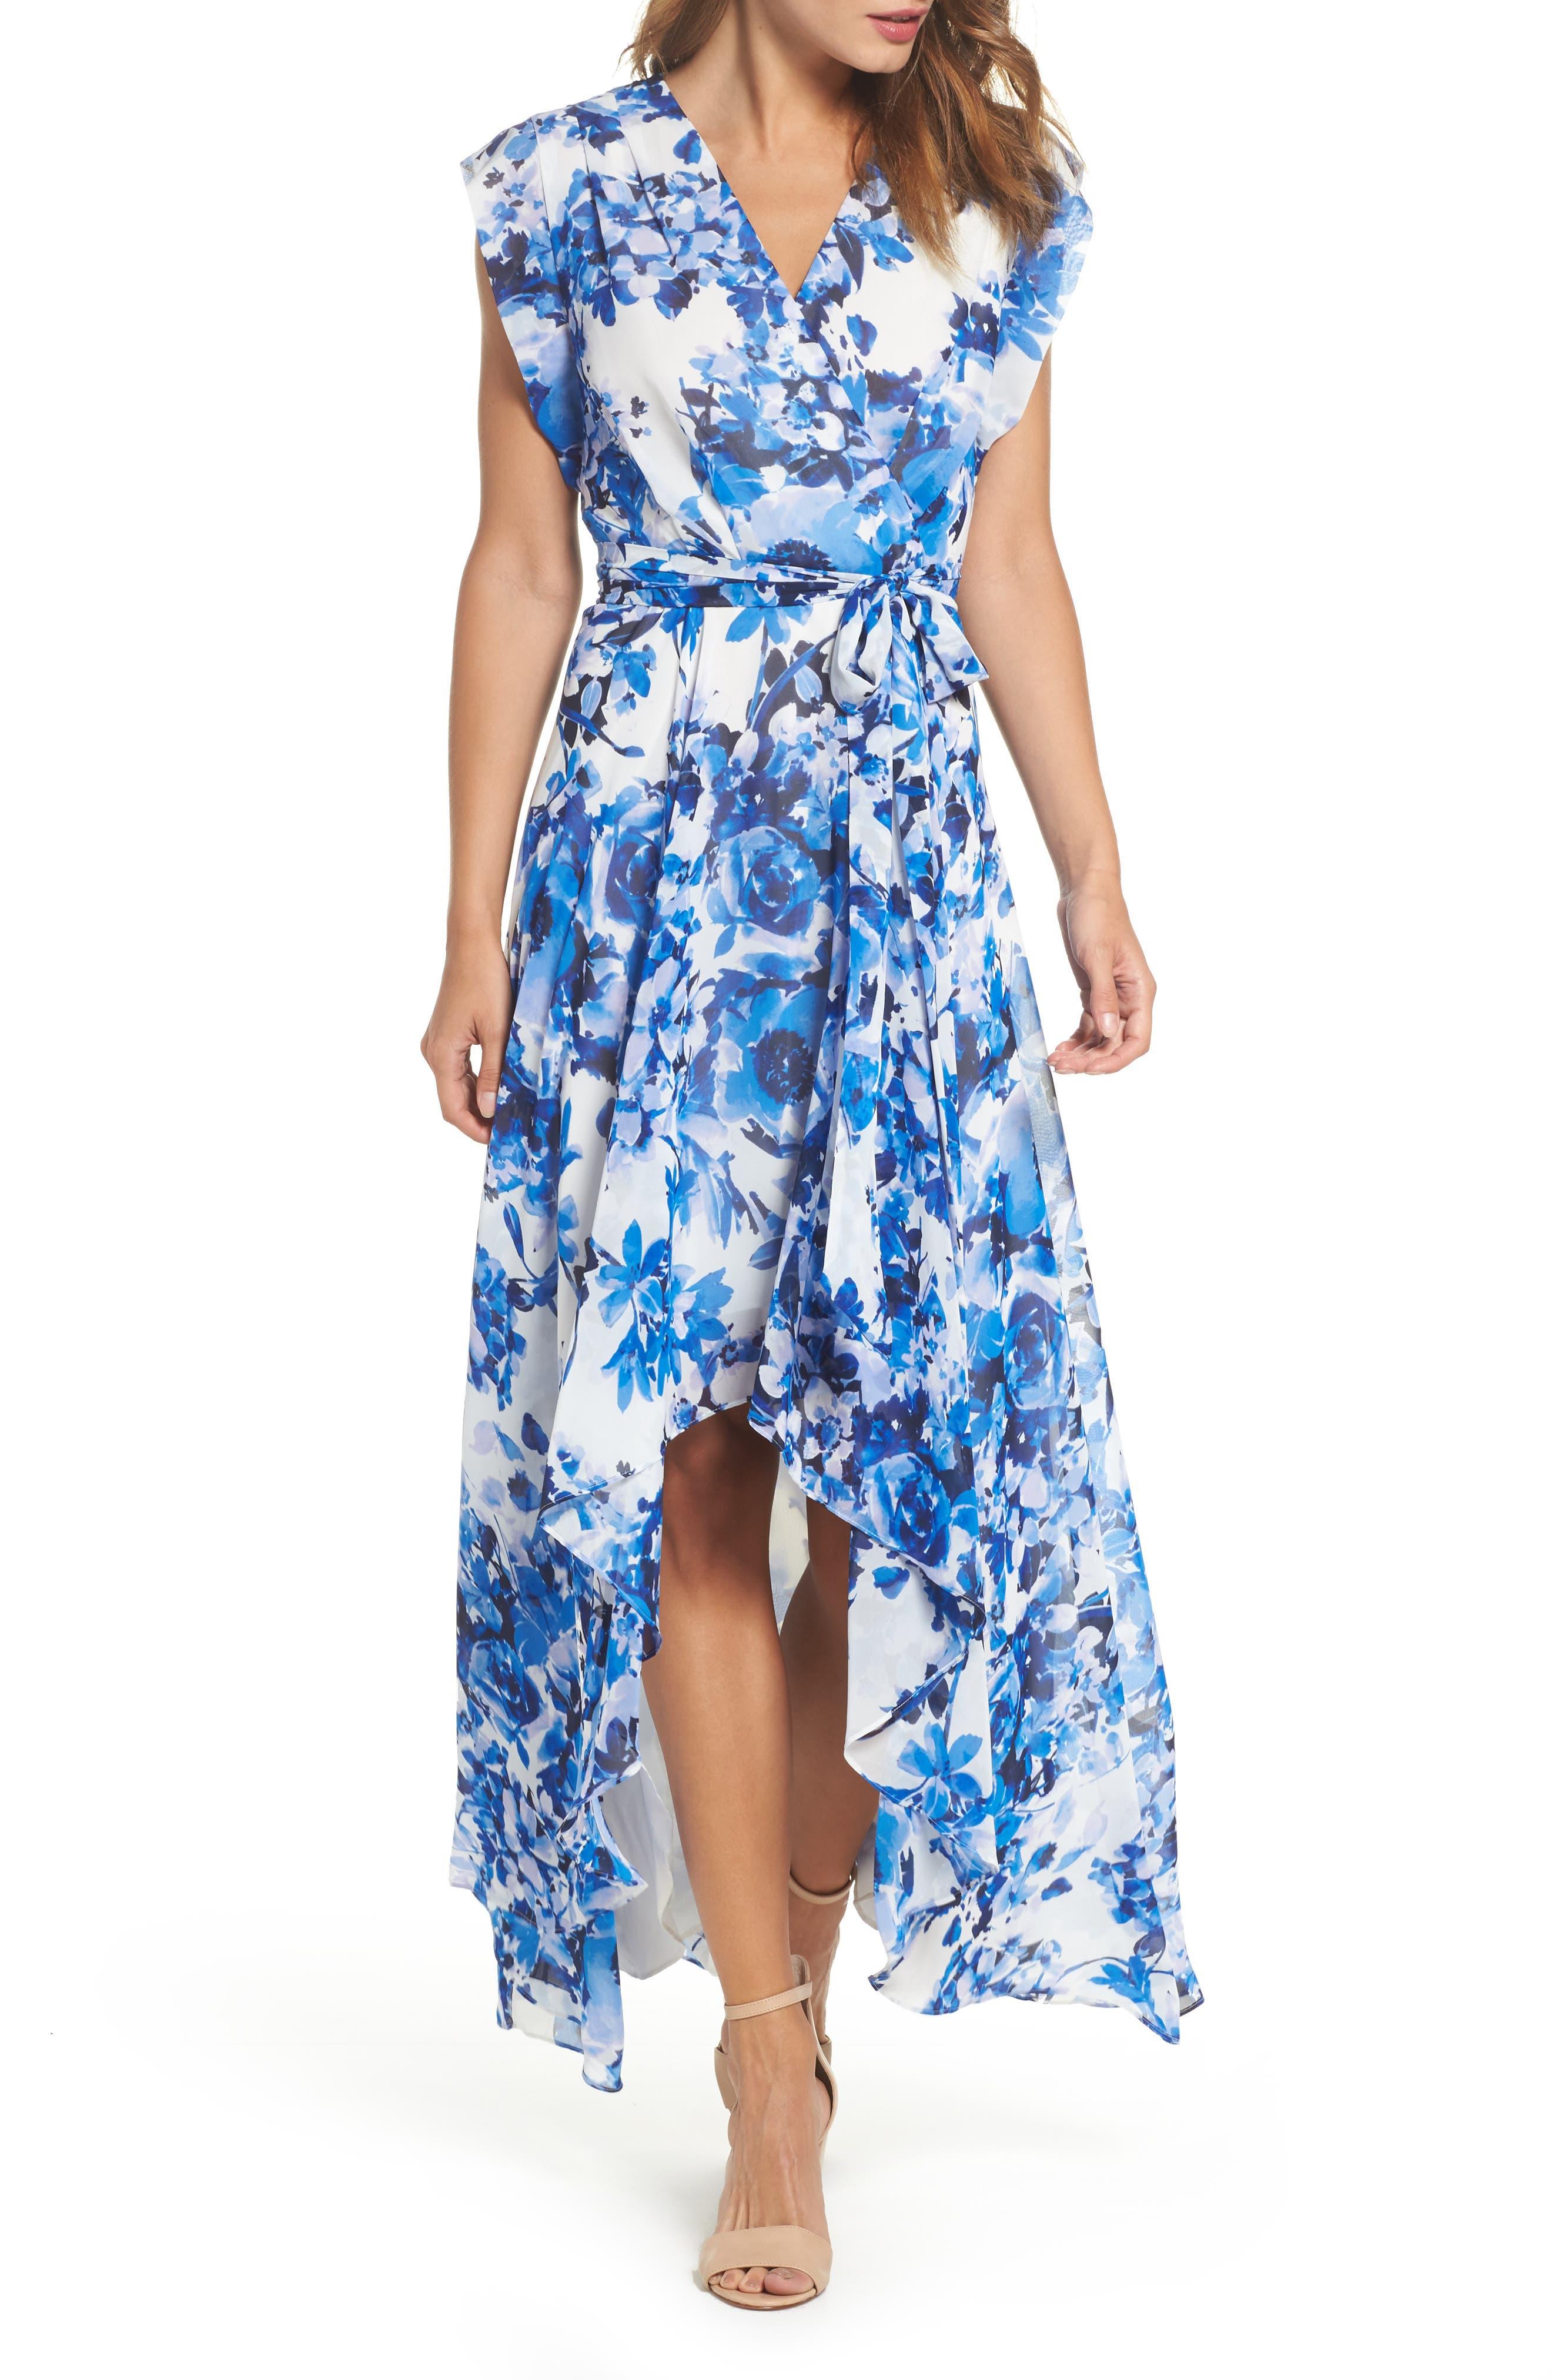 ELIZA J, Floral Ruffle High/Low Maxi Dress, Main thumbnail 1, color, BLUE